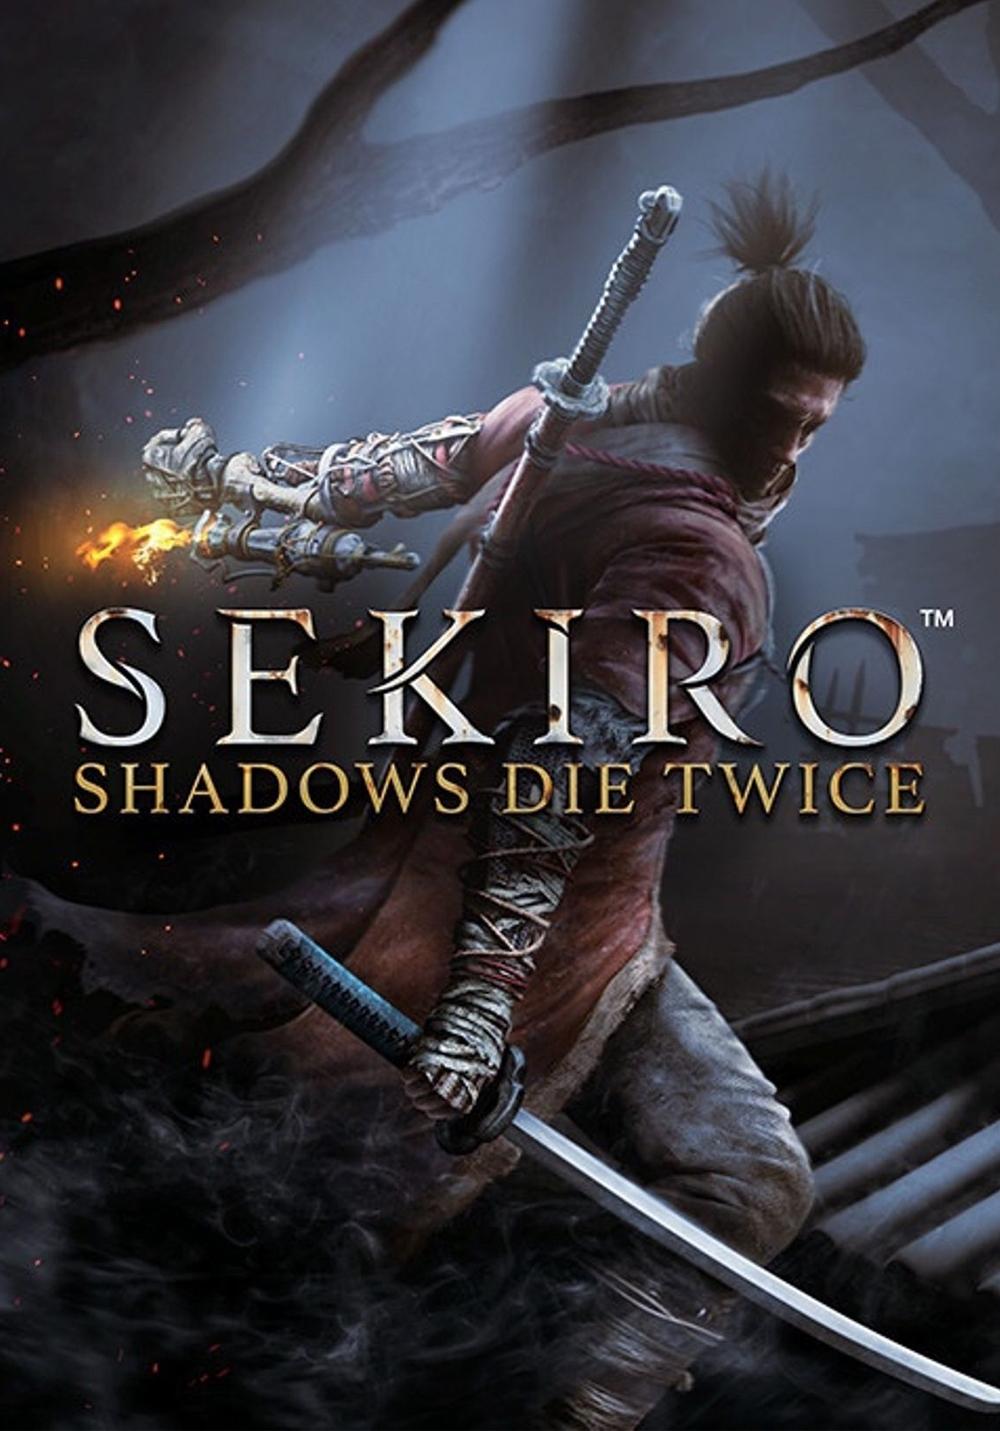 Sekiro: Shadows Die Twice - GOTY Edition (Europe)